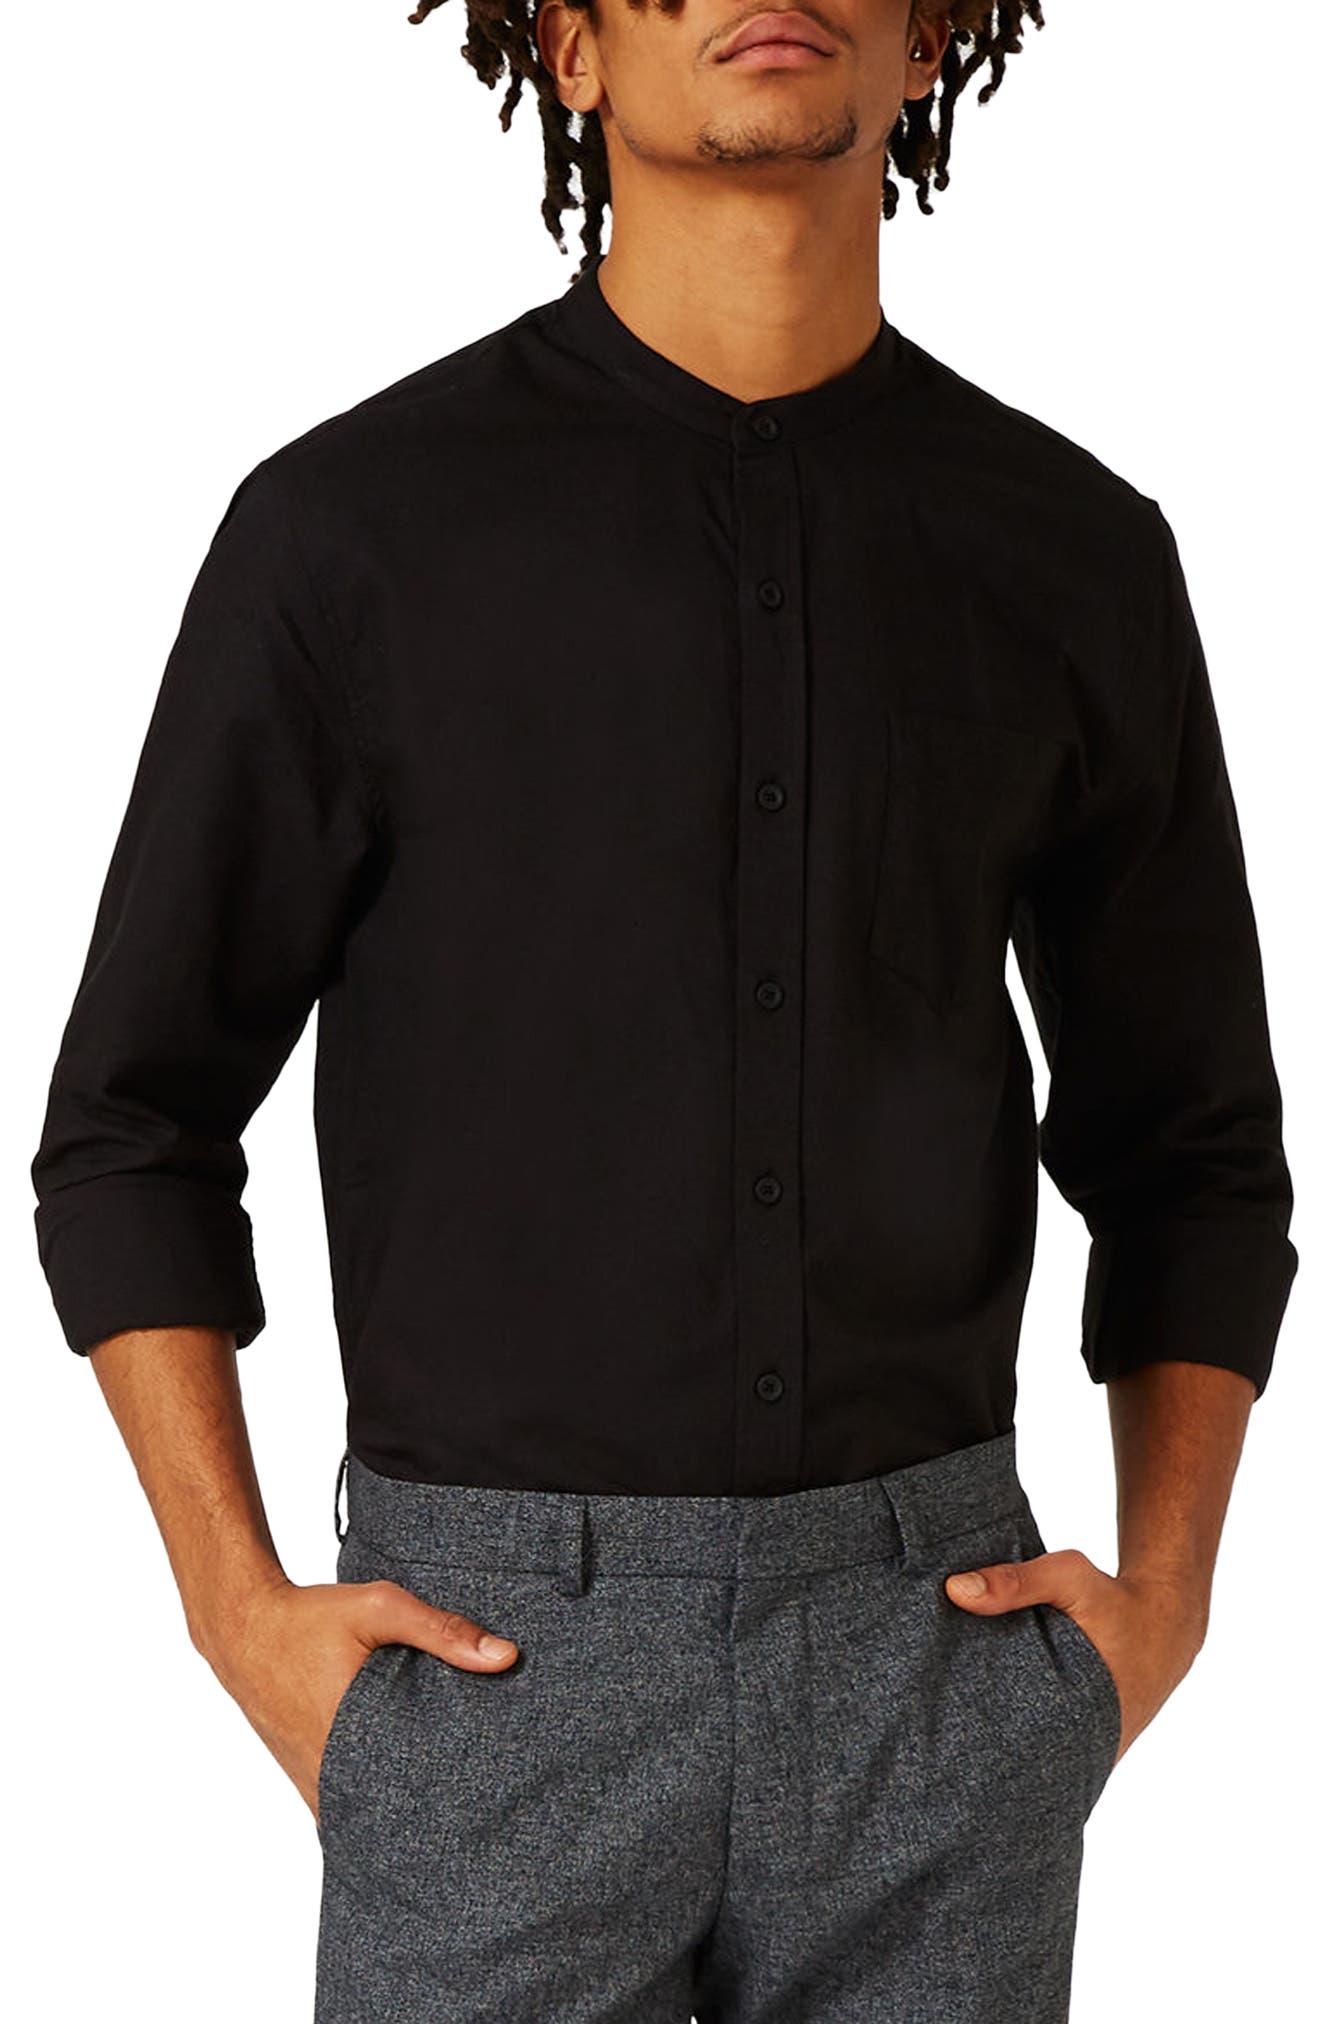 TOPMAN, Band Collar Shirt, Main thumbnail 1, color, 001